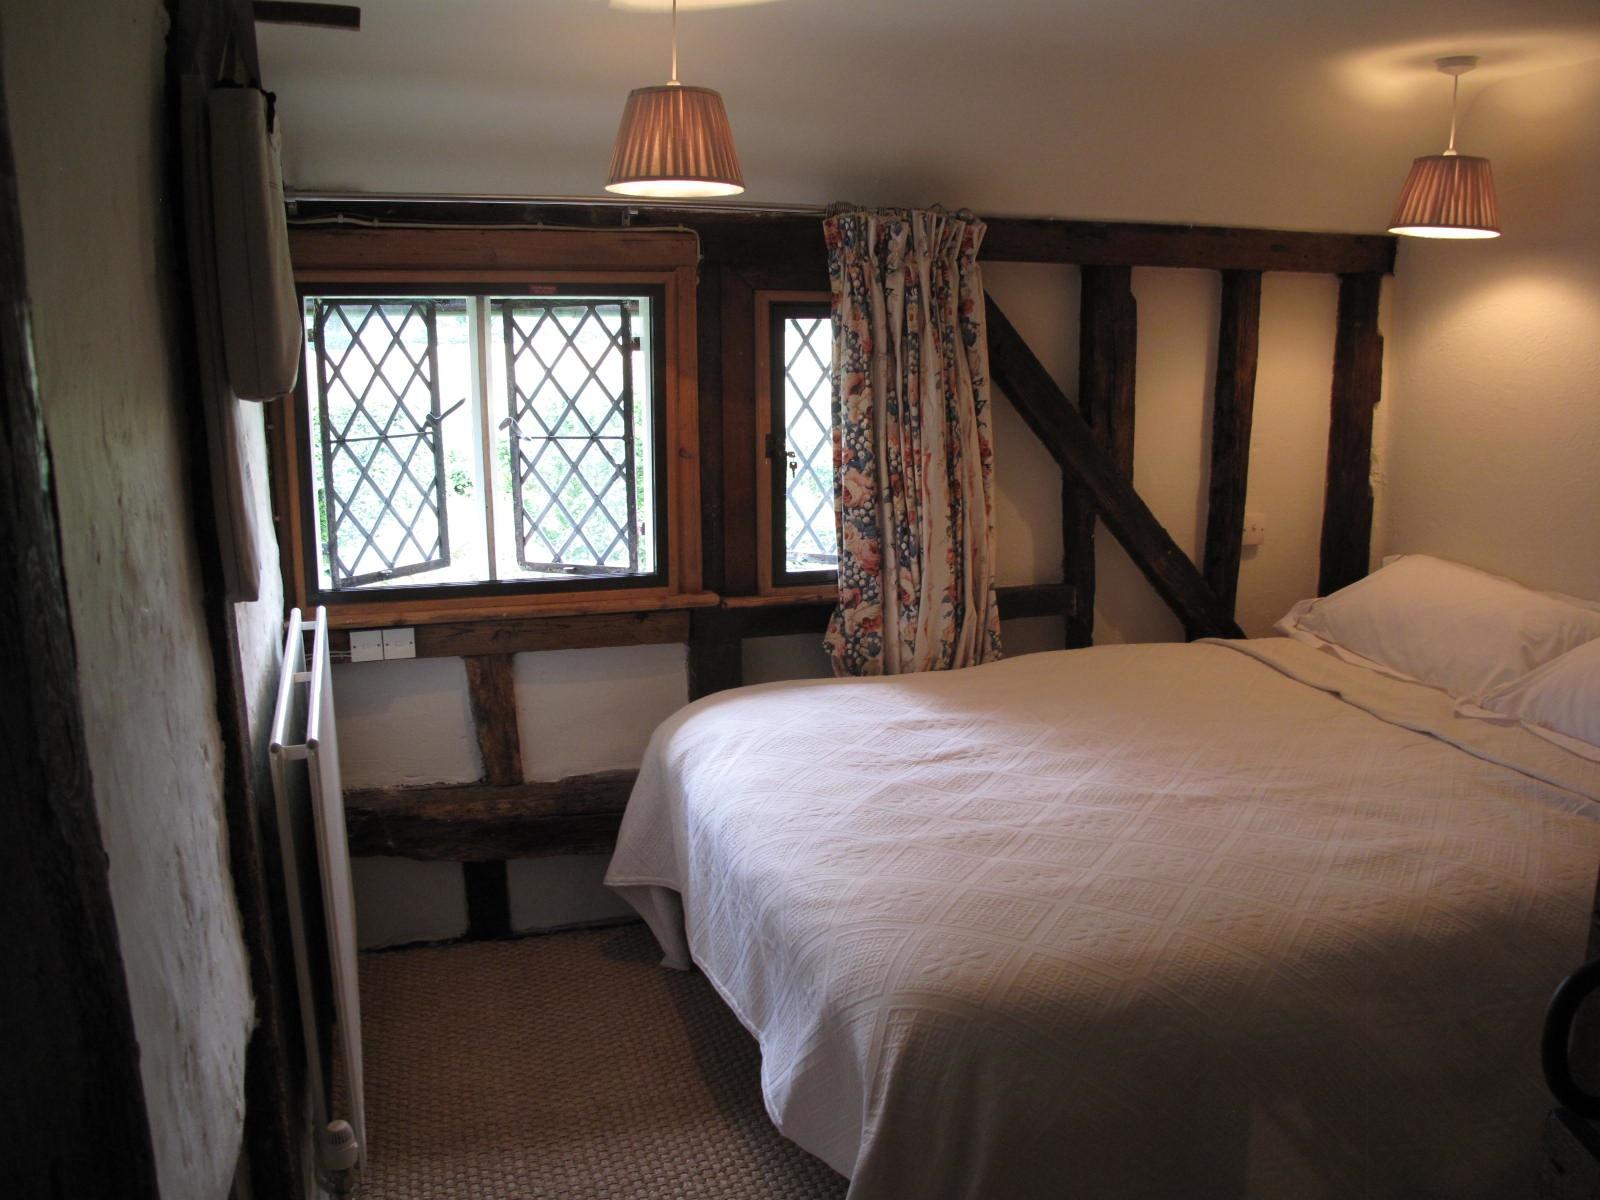 Bed And Breakfast Sevenoaks Weald